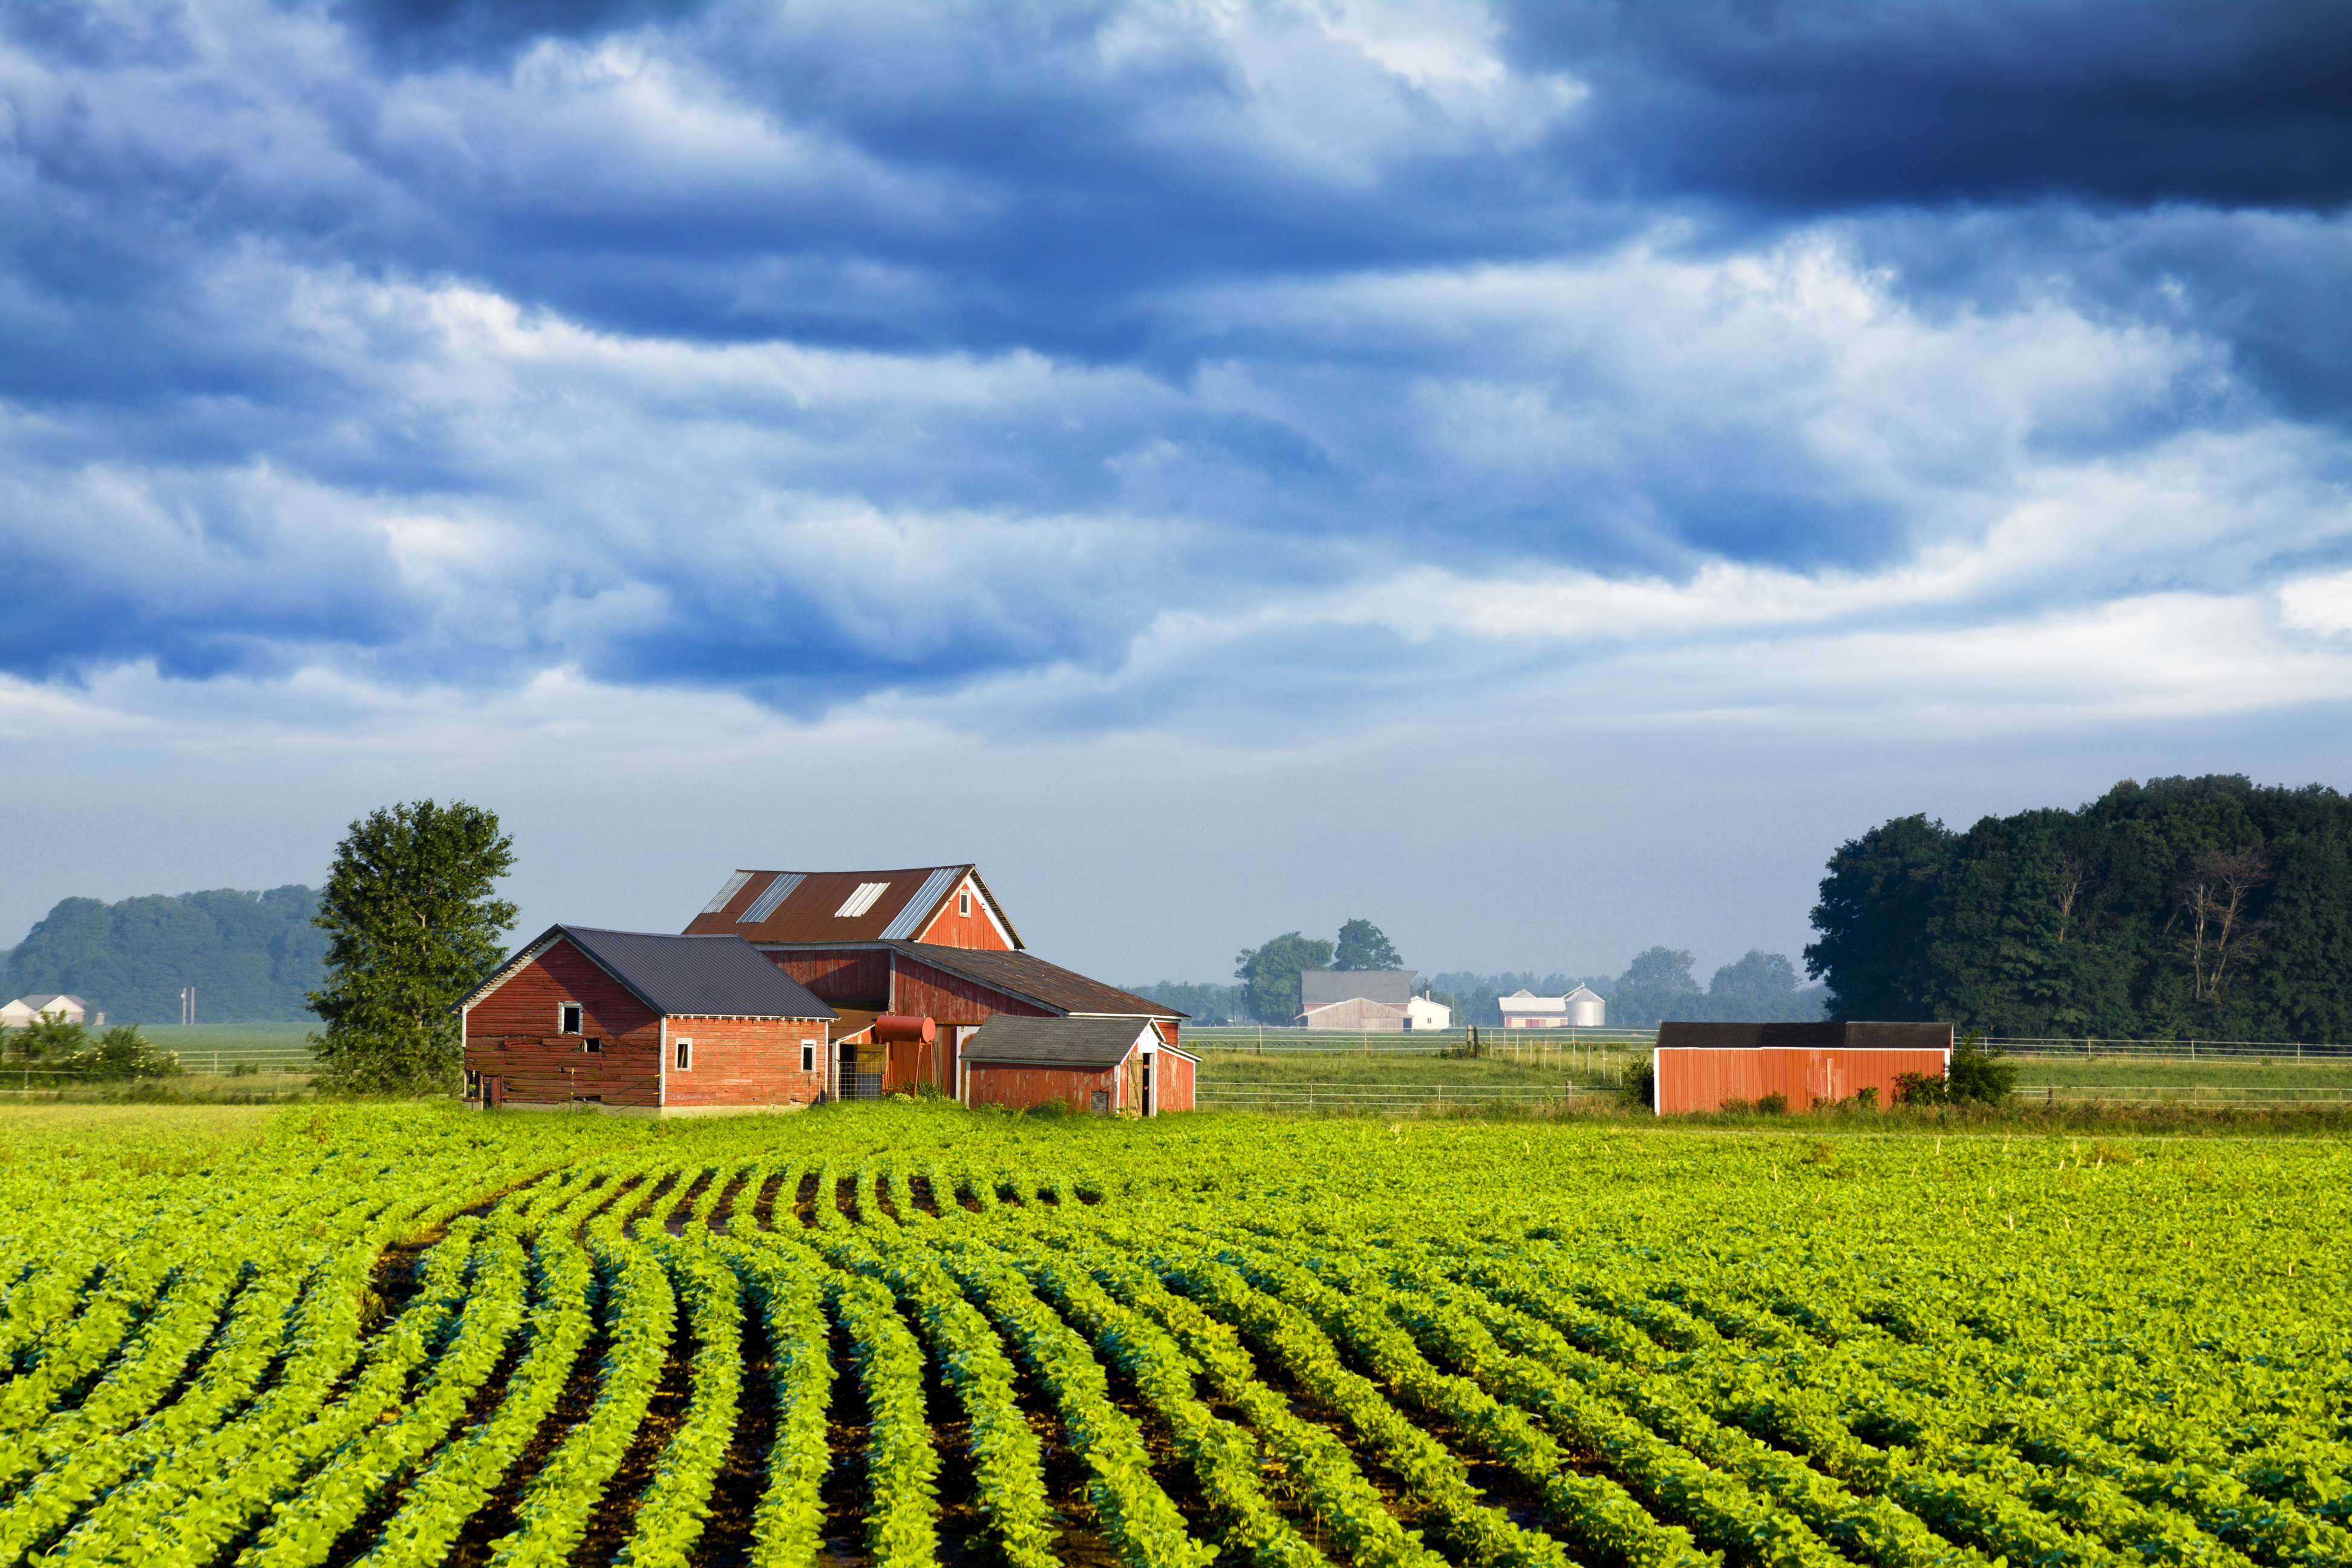 Southern USA National Farm Machinery Show